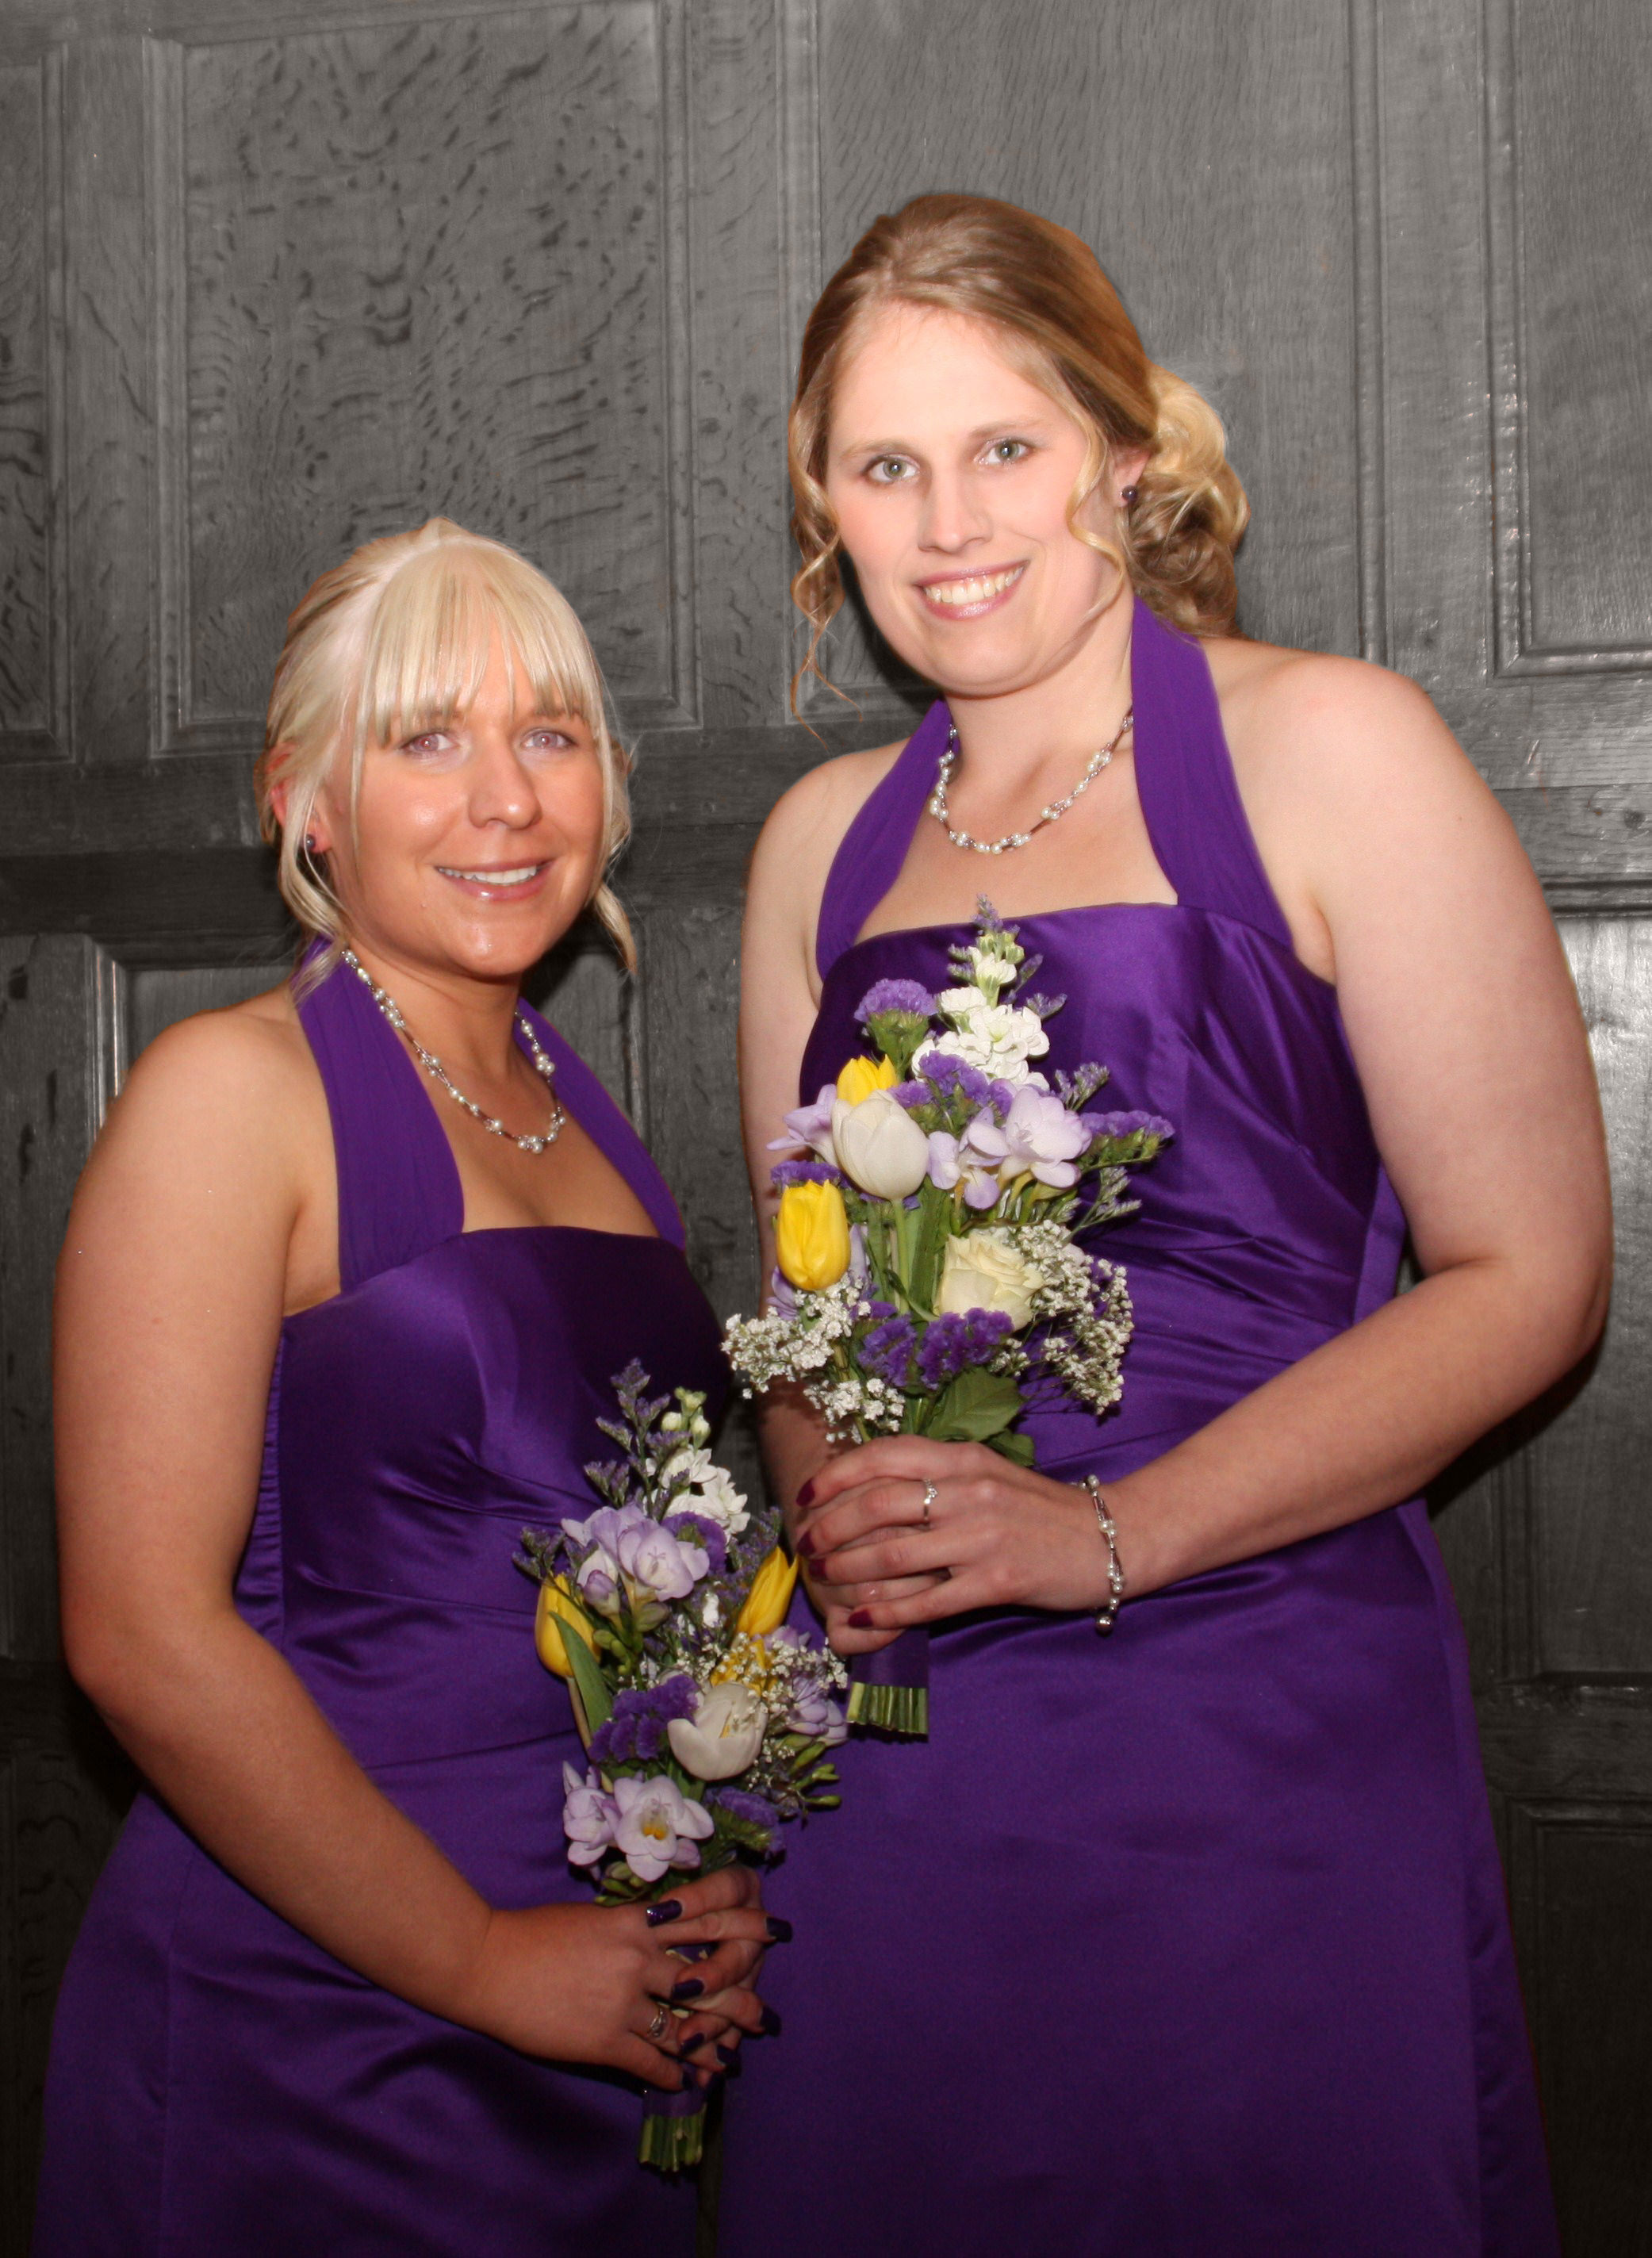 Bespoke purple satin bridesmaid dresses